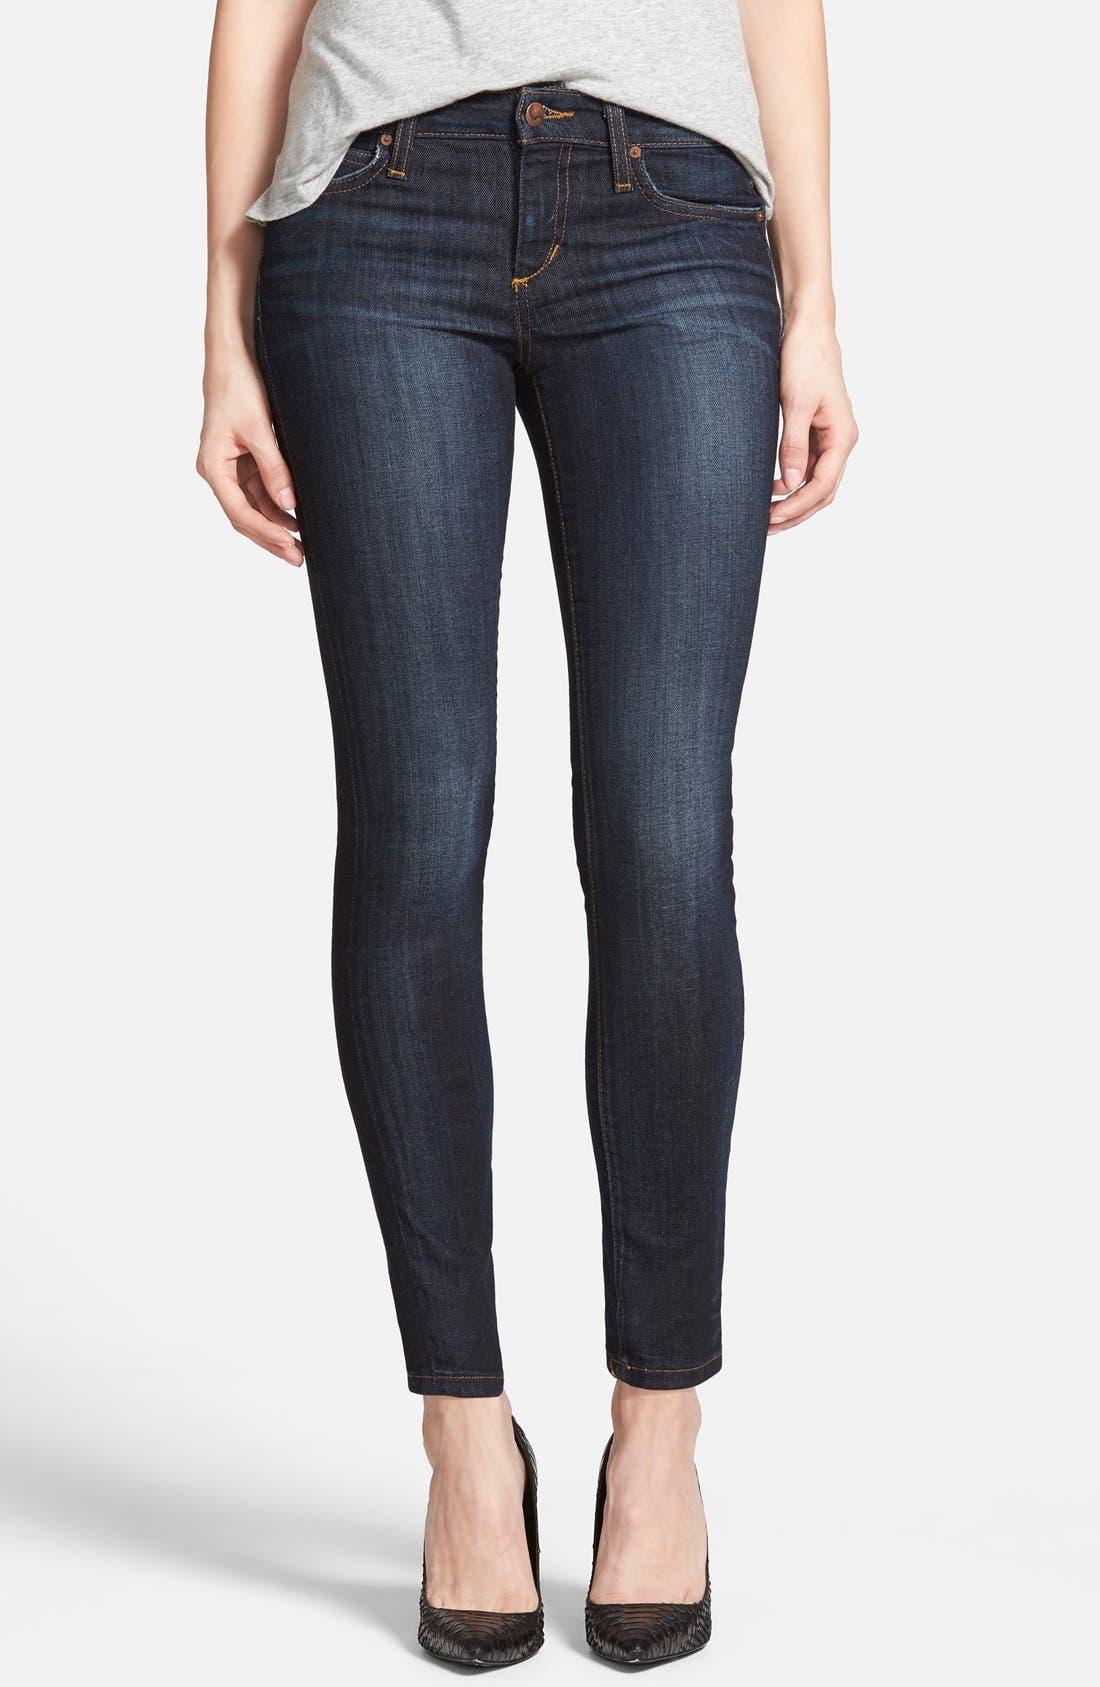 Alternate Image 1 Selected - Joe's Skinny Ankle Jeans (Bridget)